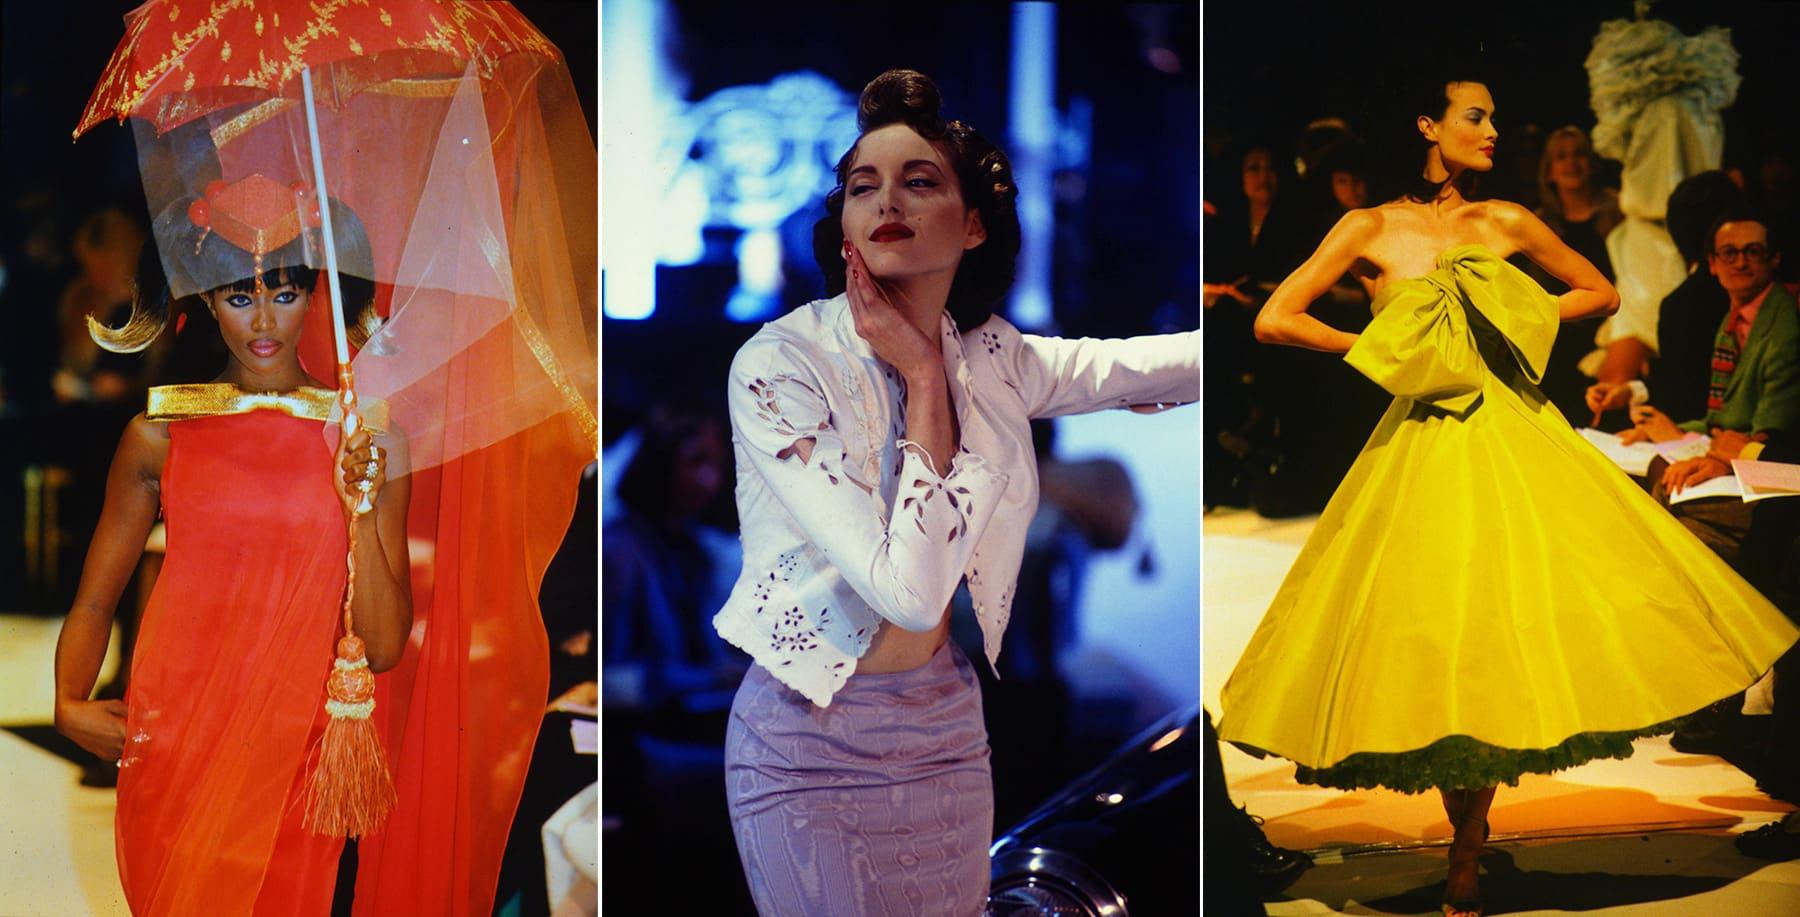 John Galliano fashion on Naomi Campbell, Madonna